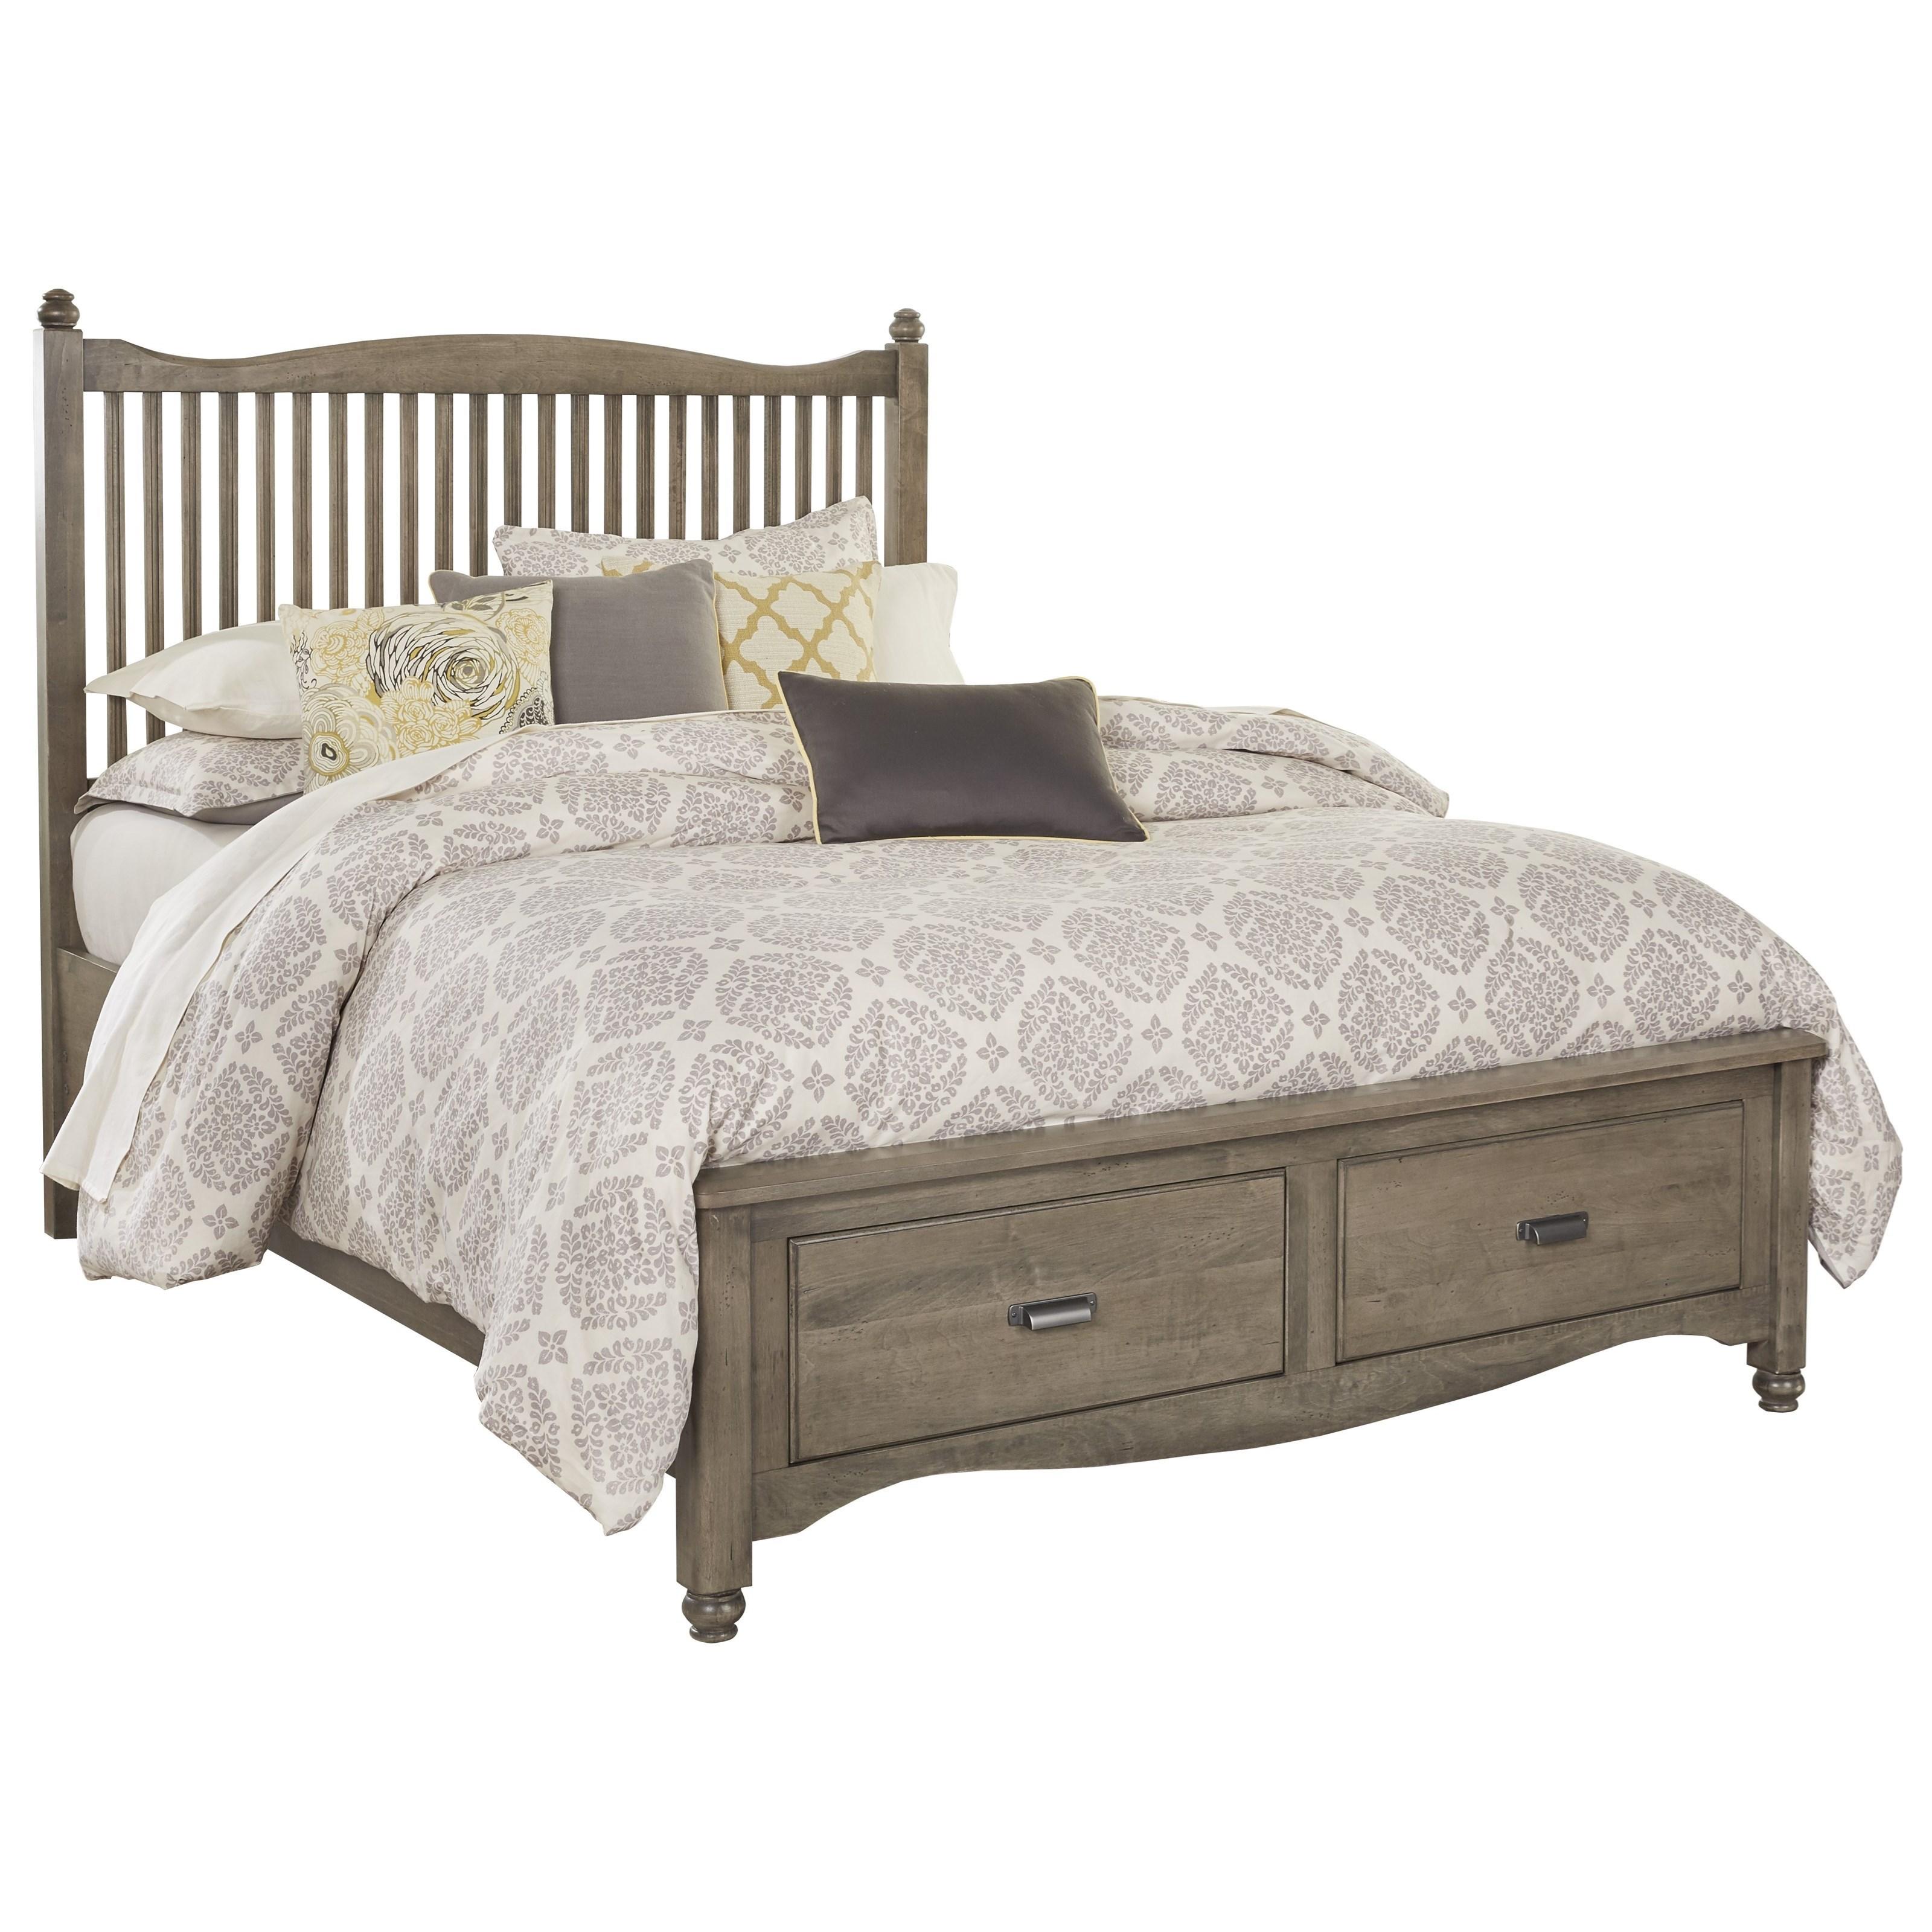 vaughan bassett american maple solid wood queen slat storage bed dunk bright furniture. Black Bedroom Furniture Sets. Home Design Ideas